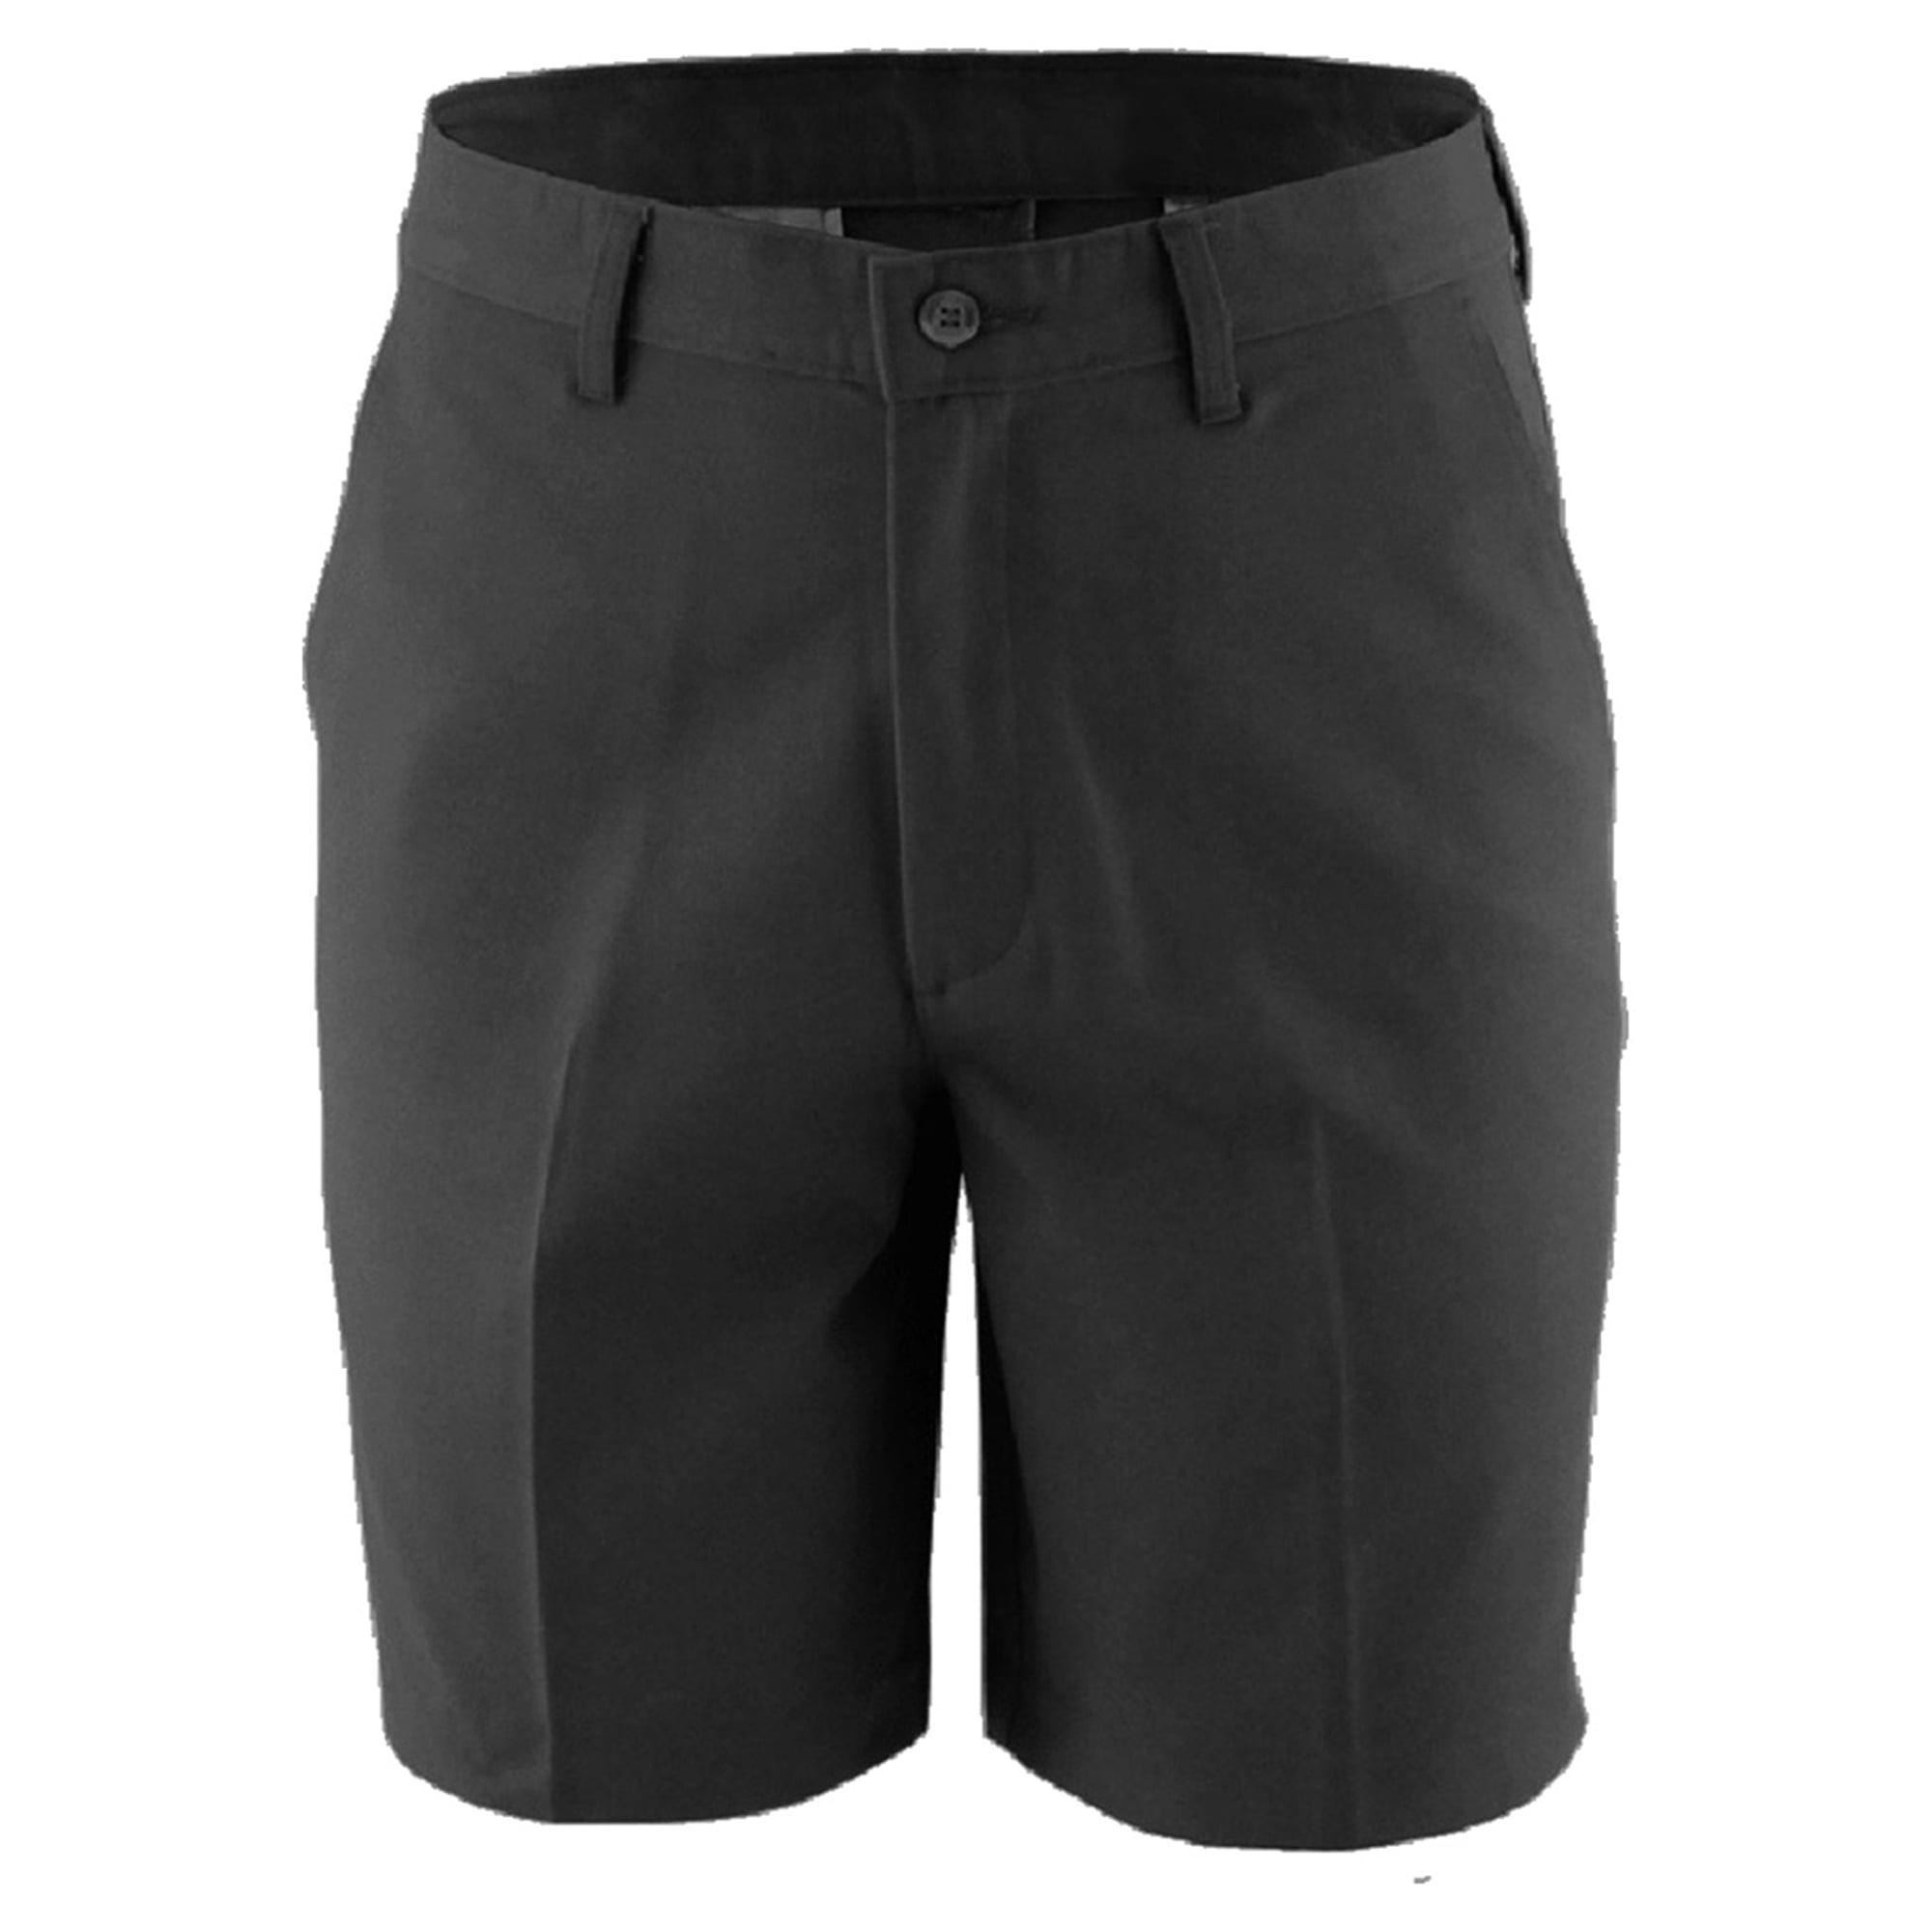 Edwards Garment Men's Flat Front Chino Short